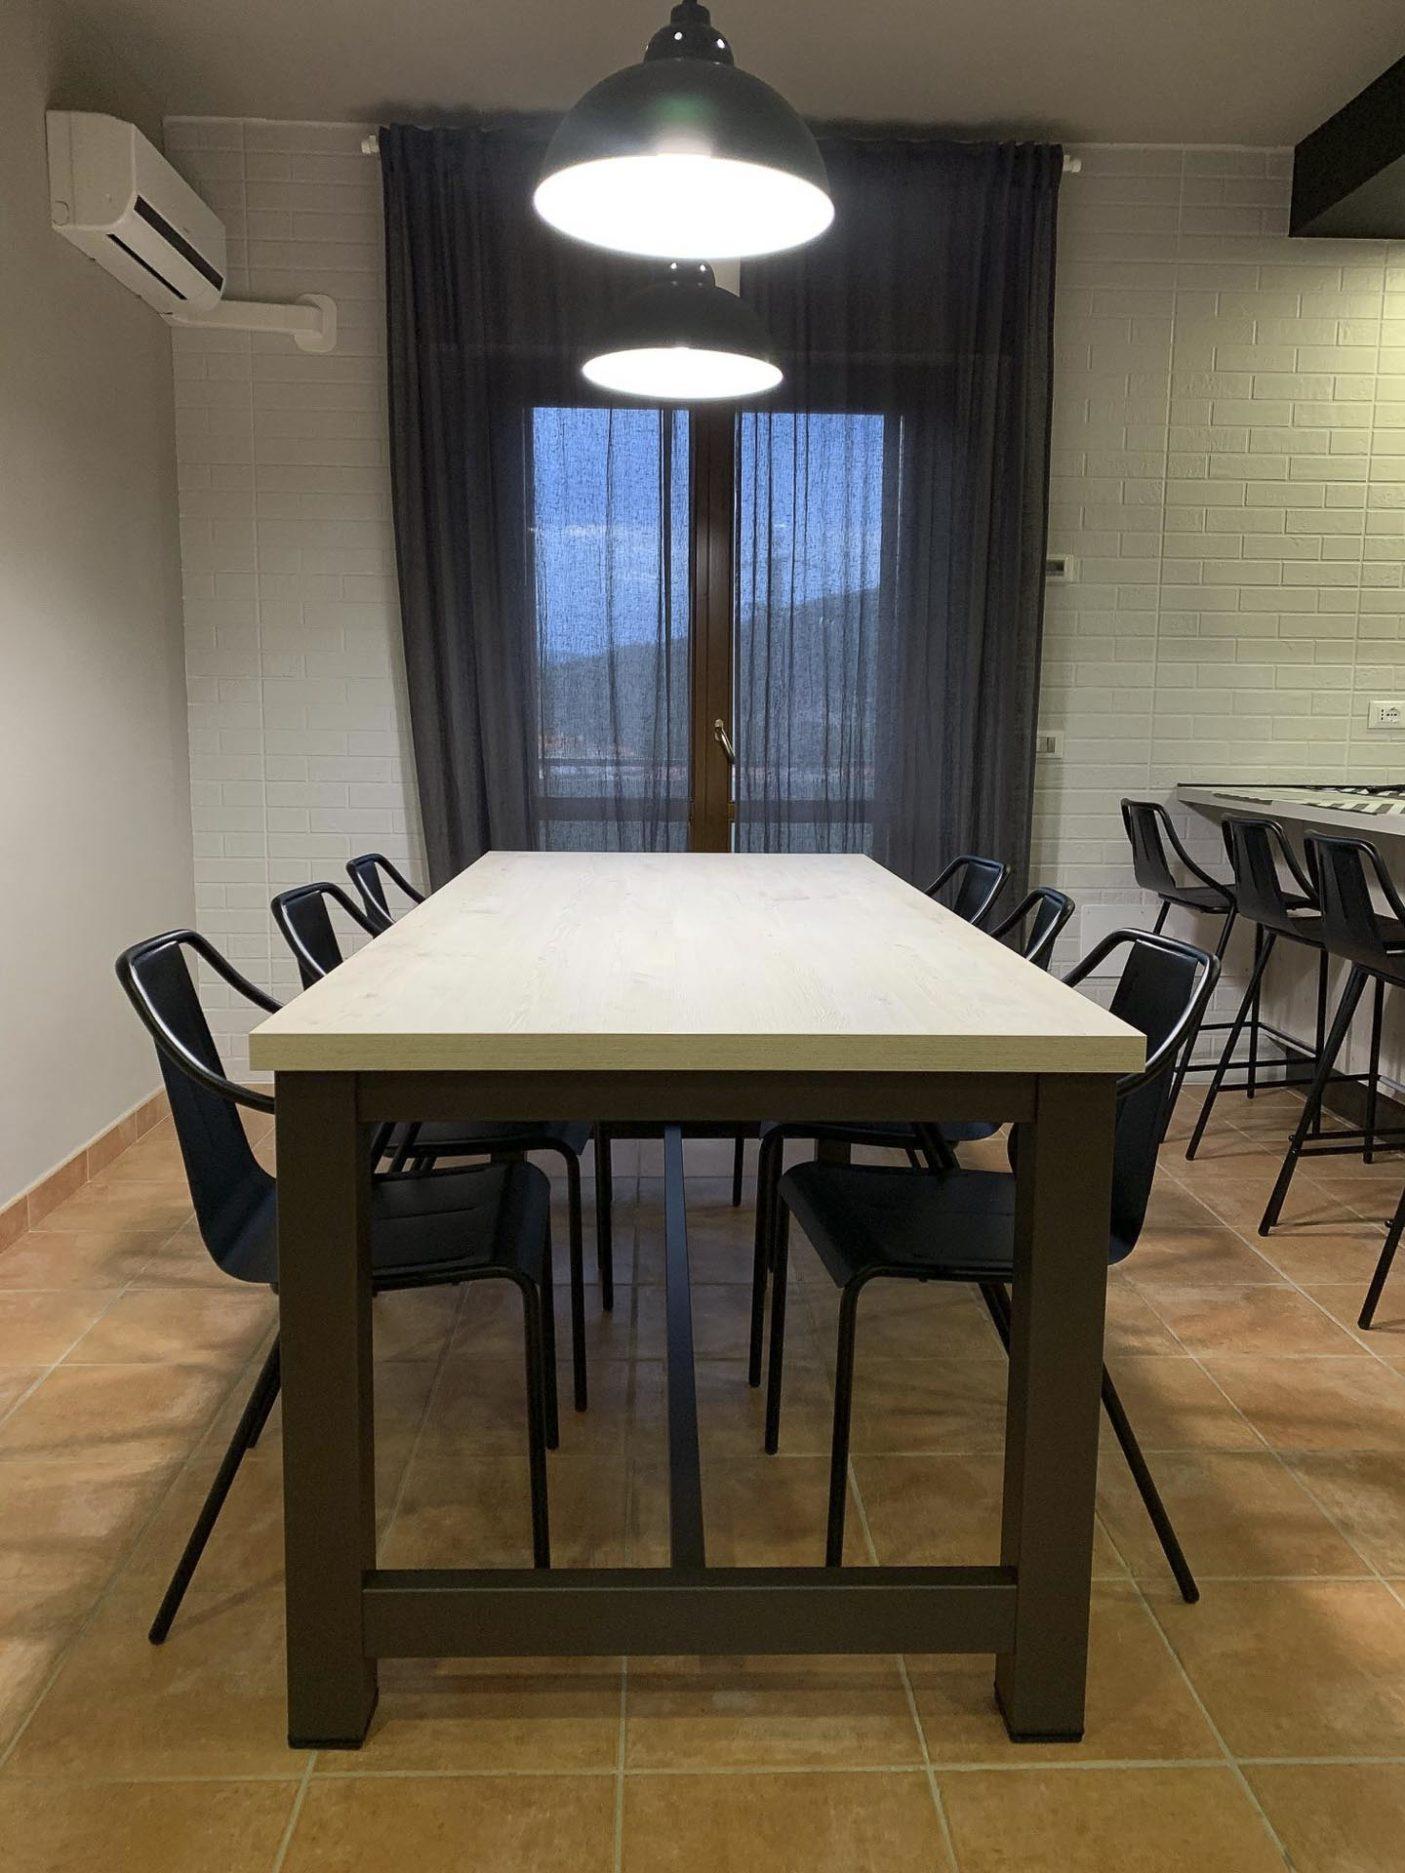 Cucina-Creo-Kitchens-Kyra-a-Telaio6.jpg